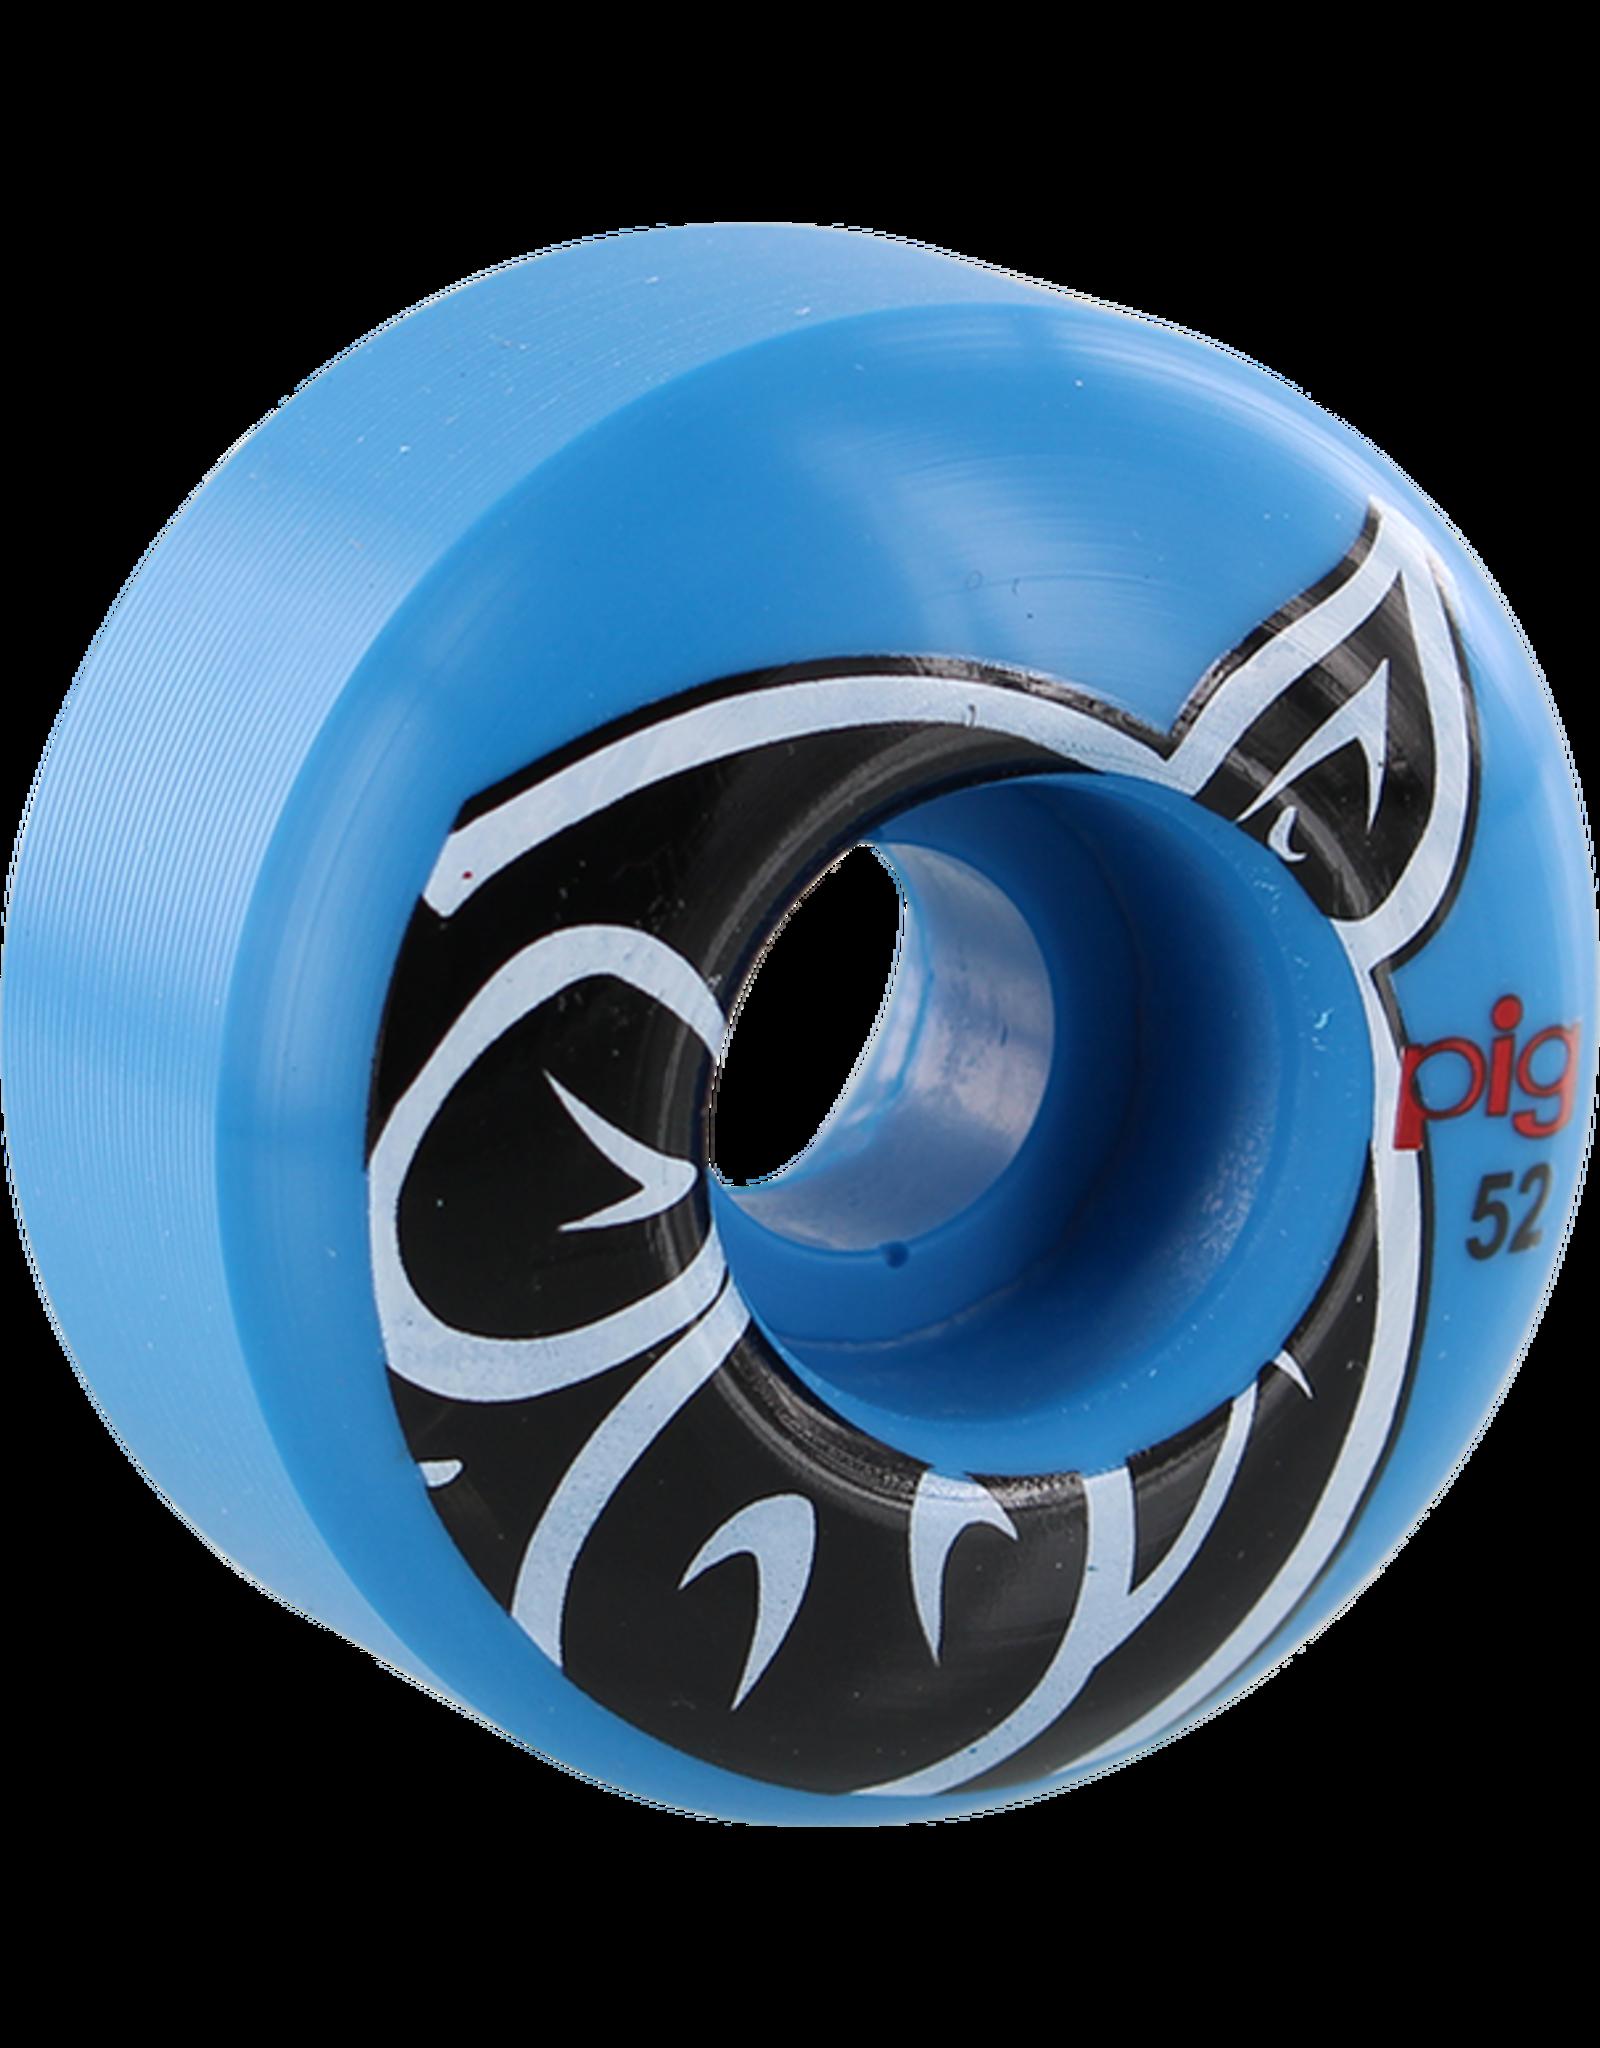 pig PROLINE HEAD 52mm BLUE